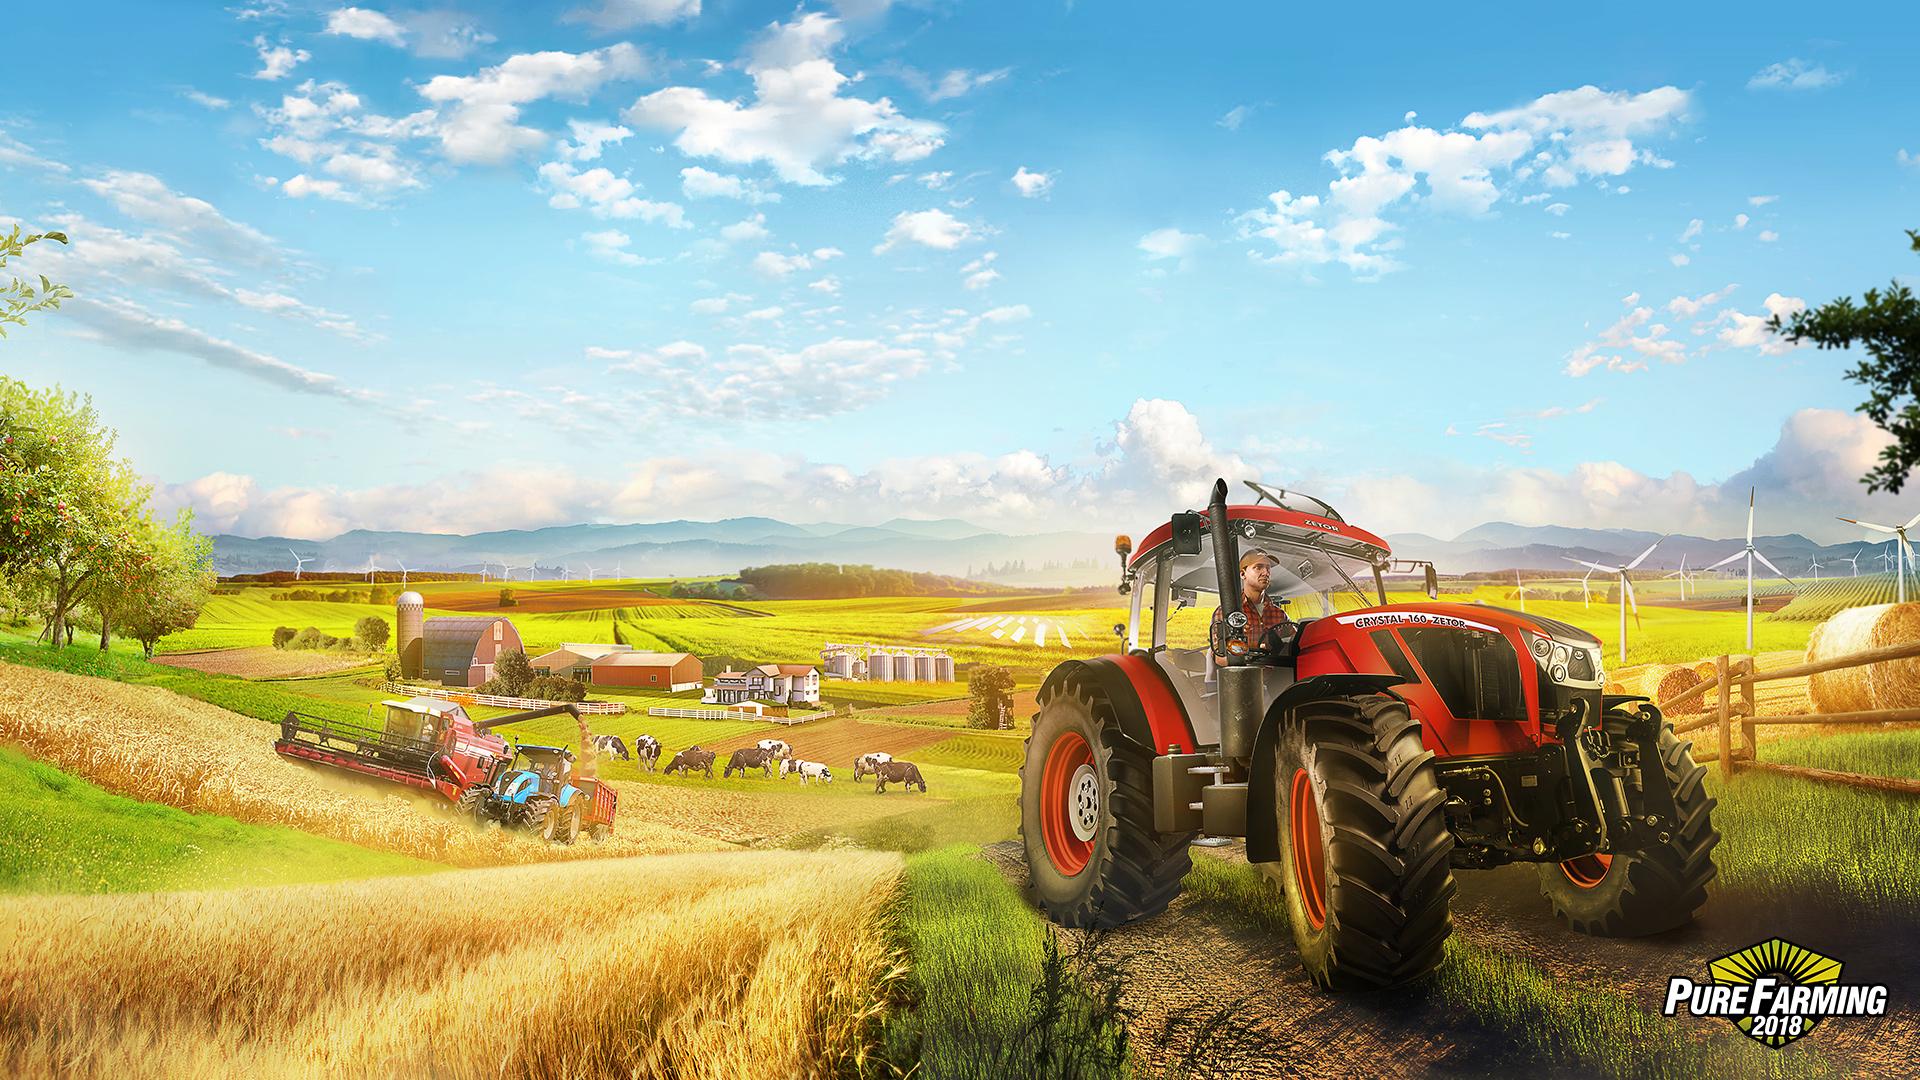 Pure Farming 2018 Trailer Comes in Threes   n3rdabl3 1920x1080